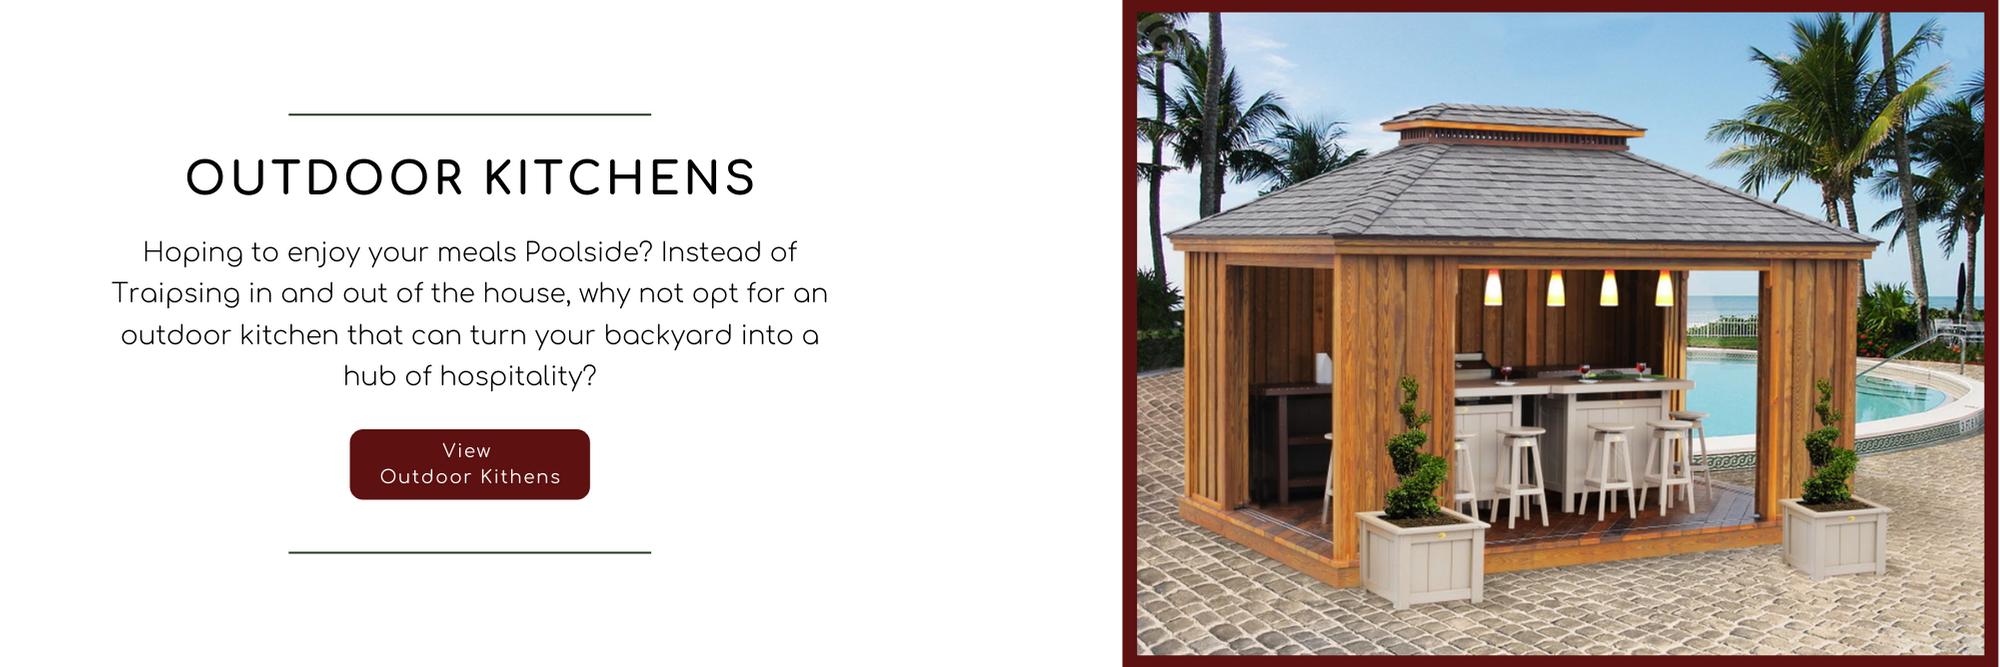 outdoor-kitchen-web-liner.png